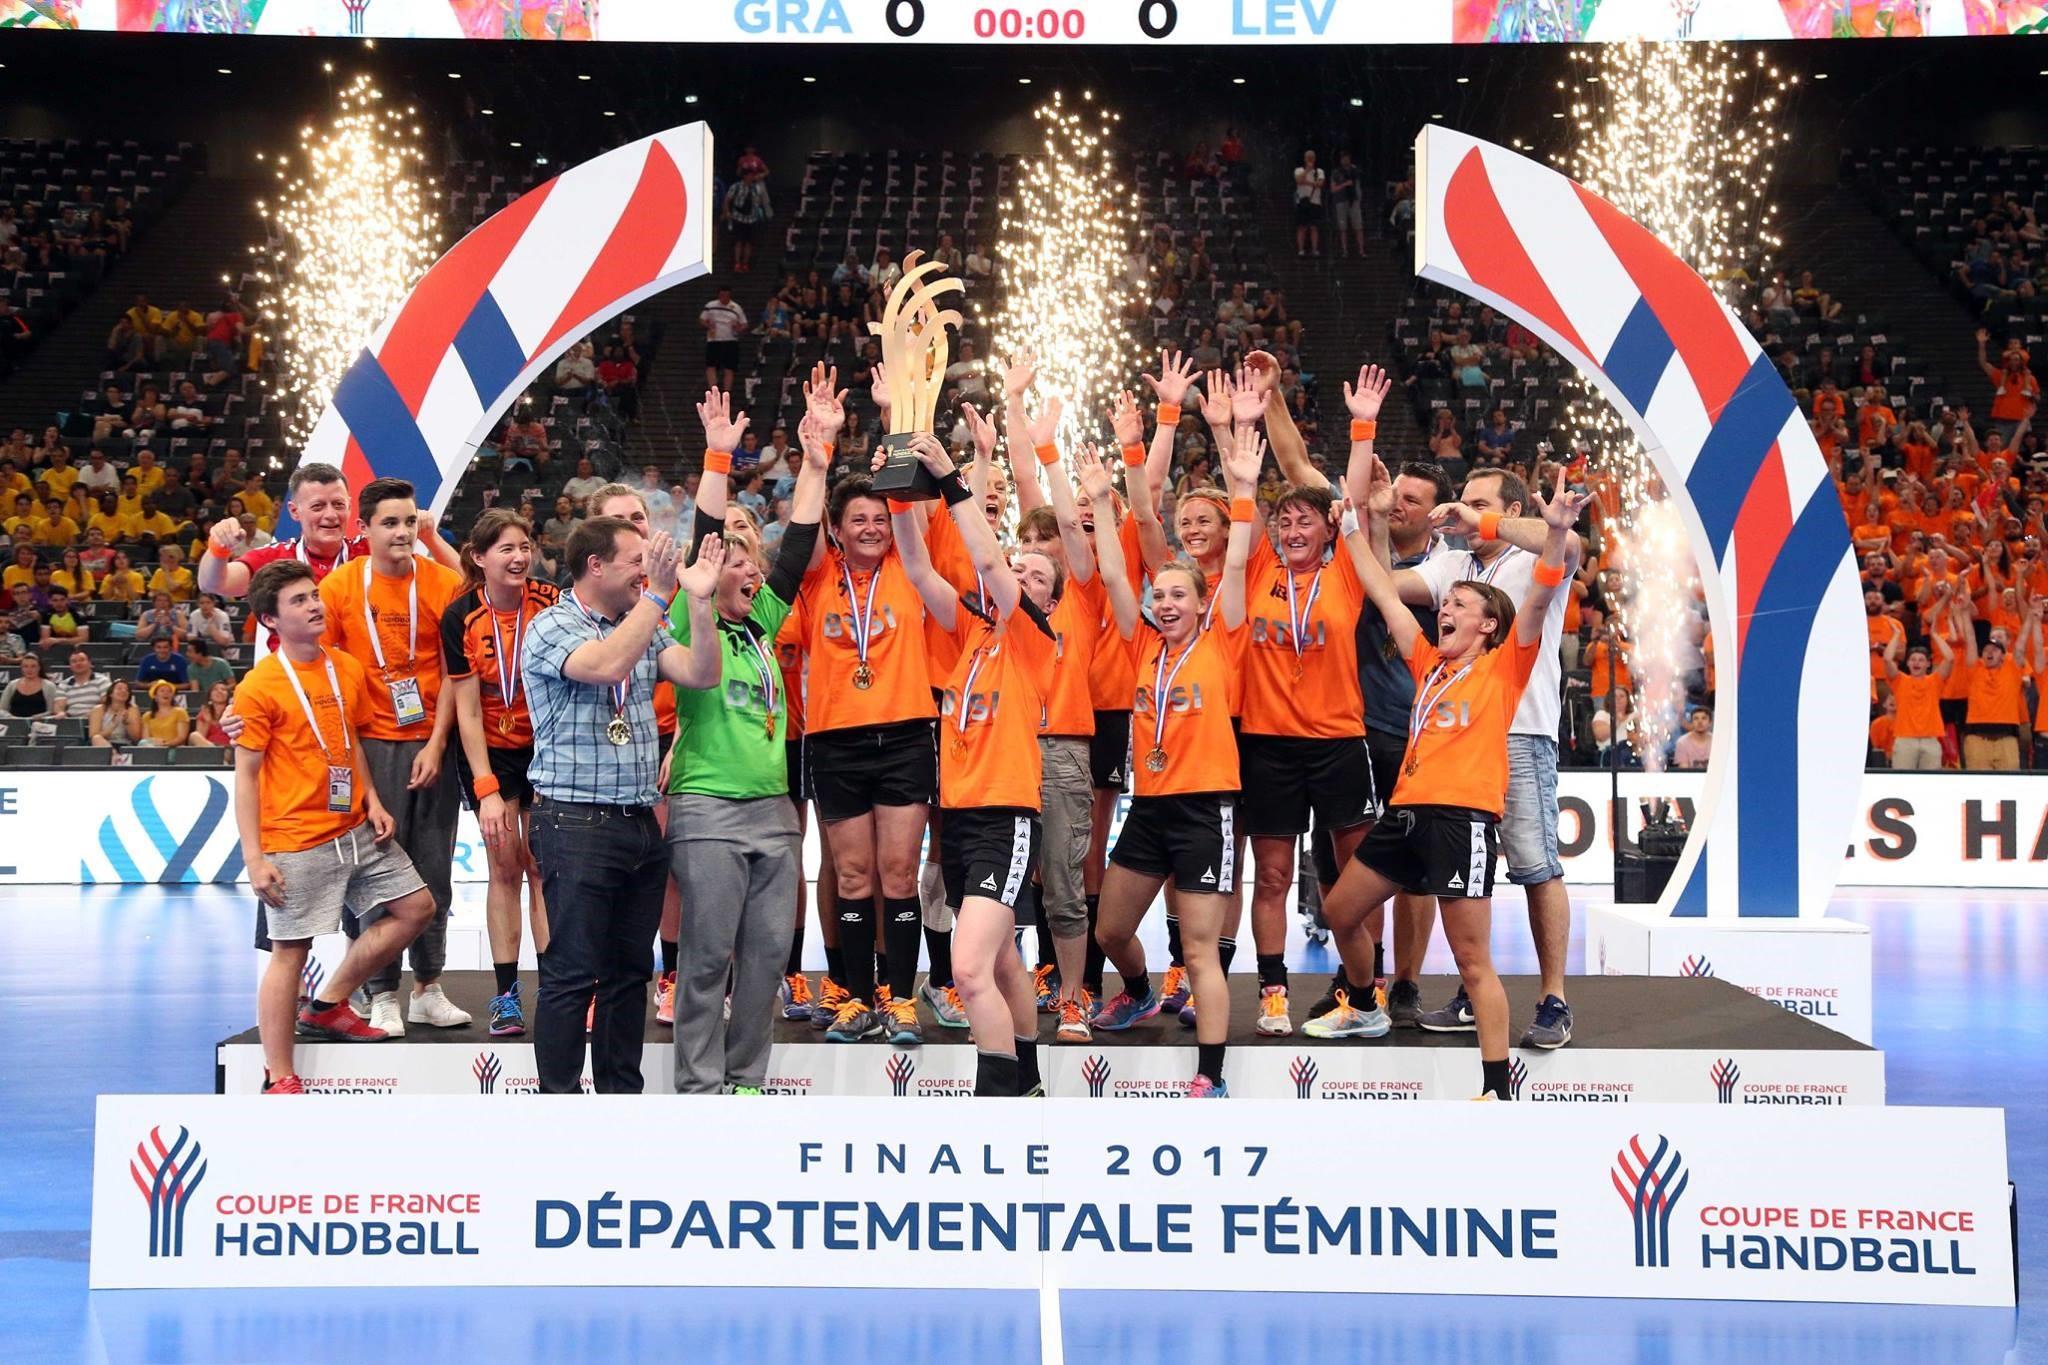 Ev nements douvres handball club - Coupe de france feminine handball ...